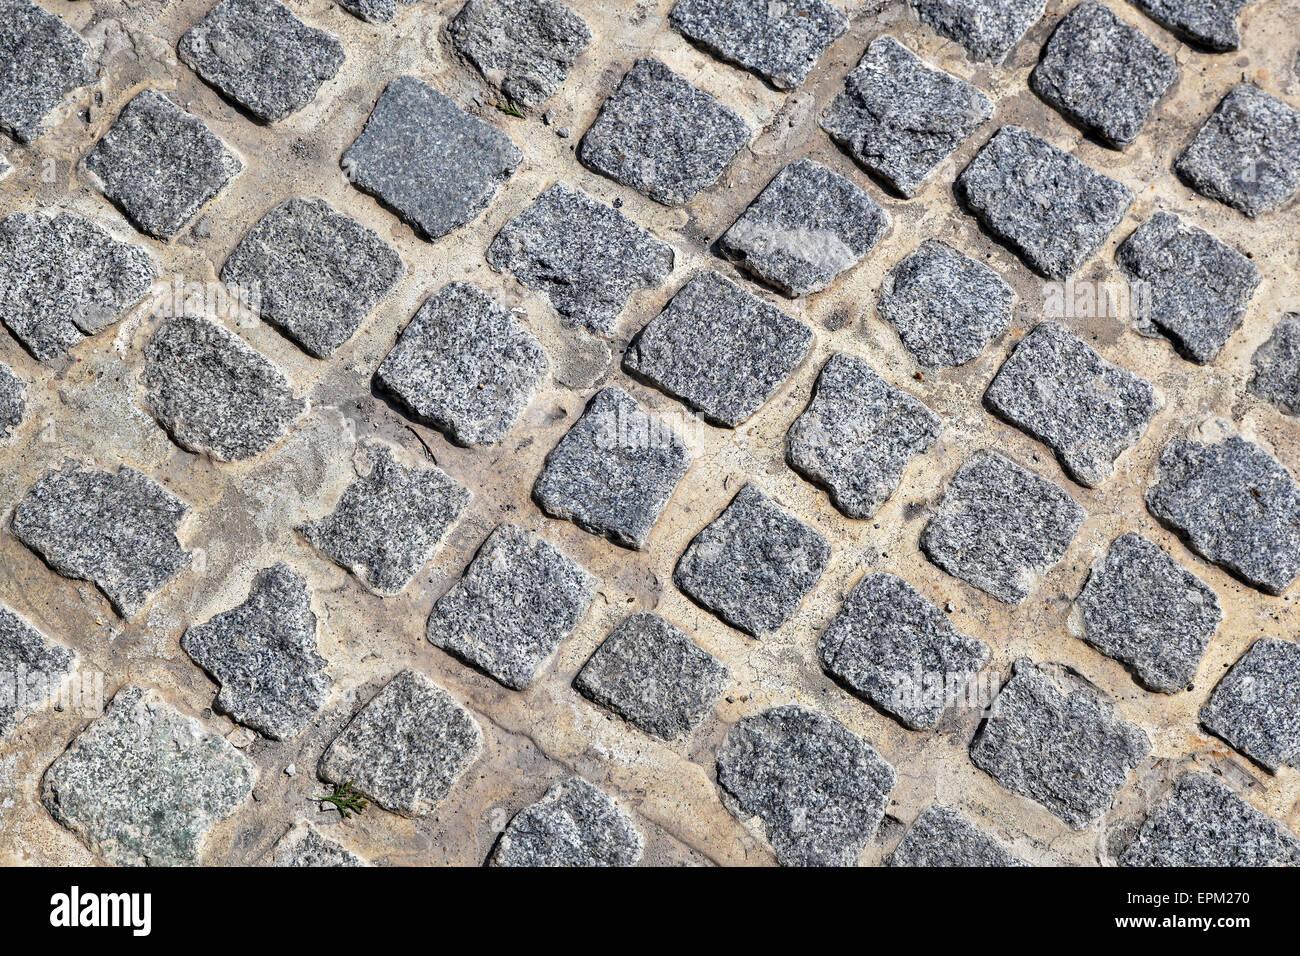 Cobblestone - Stock Image